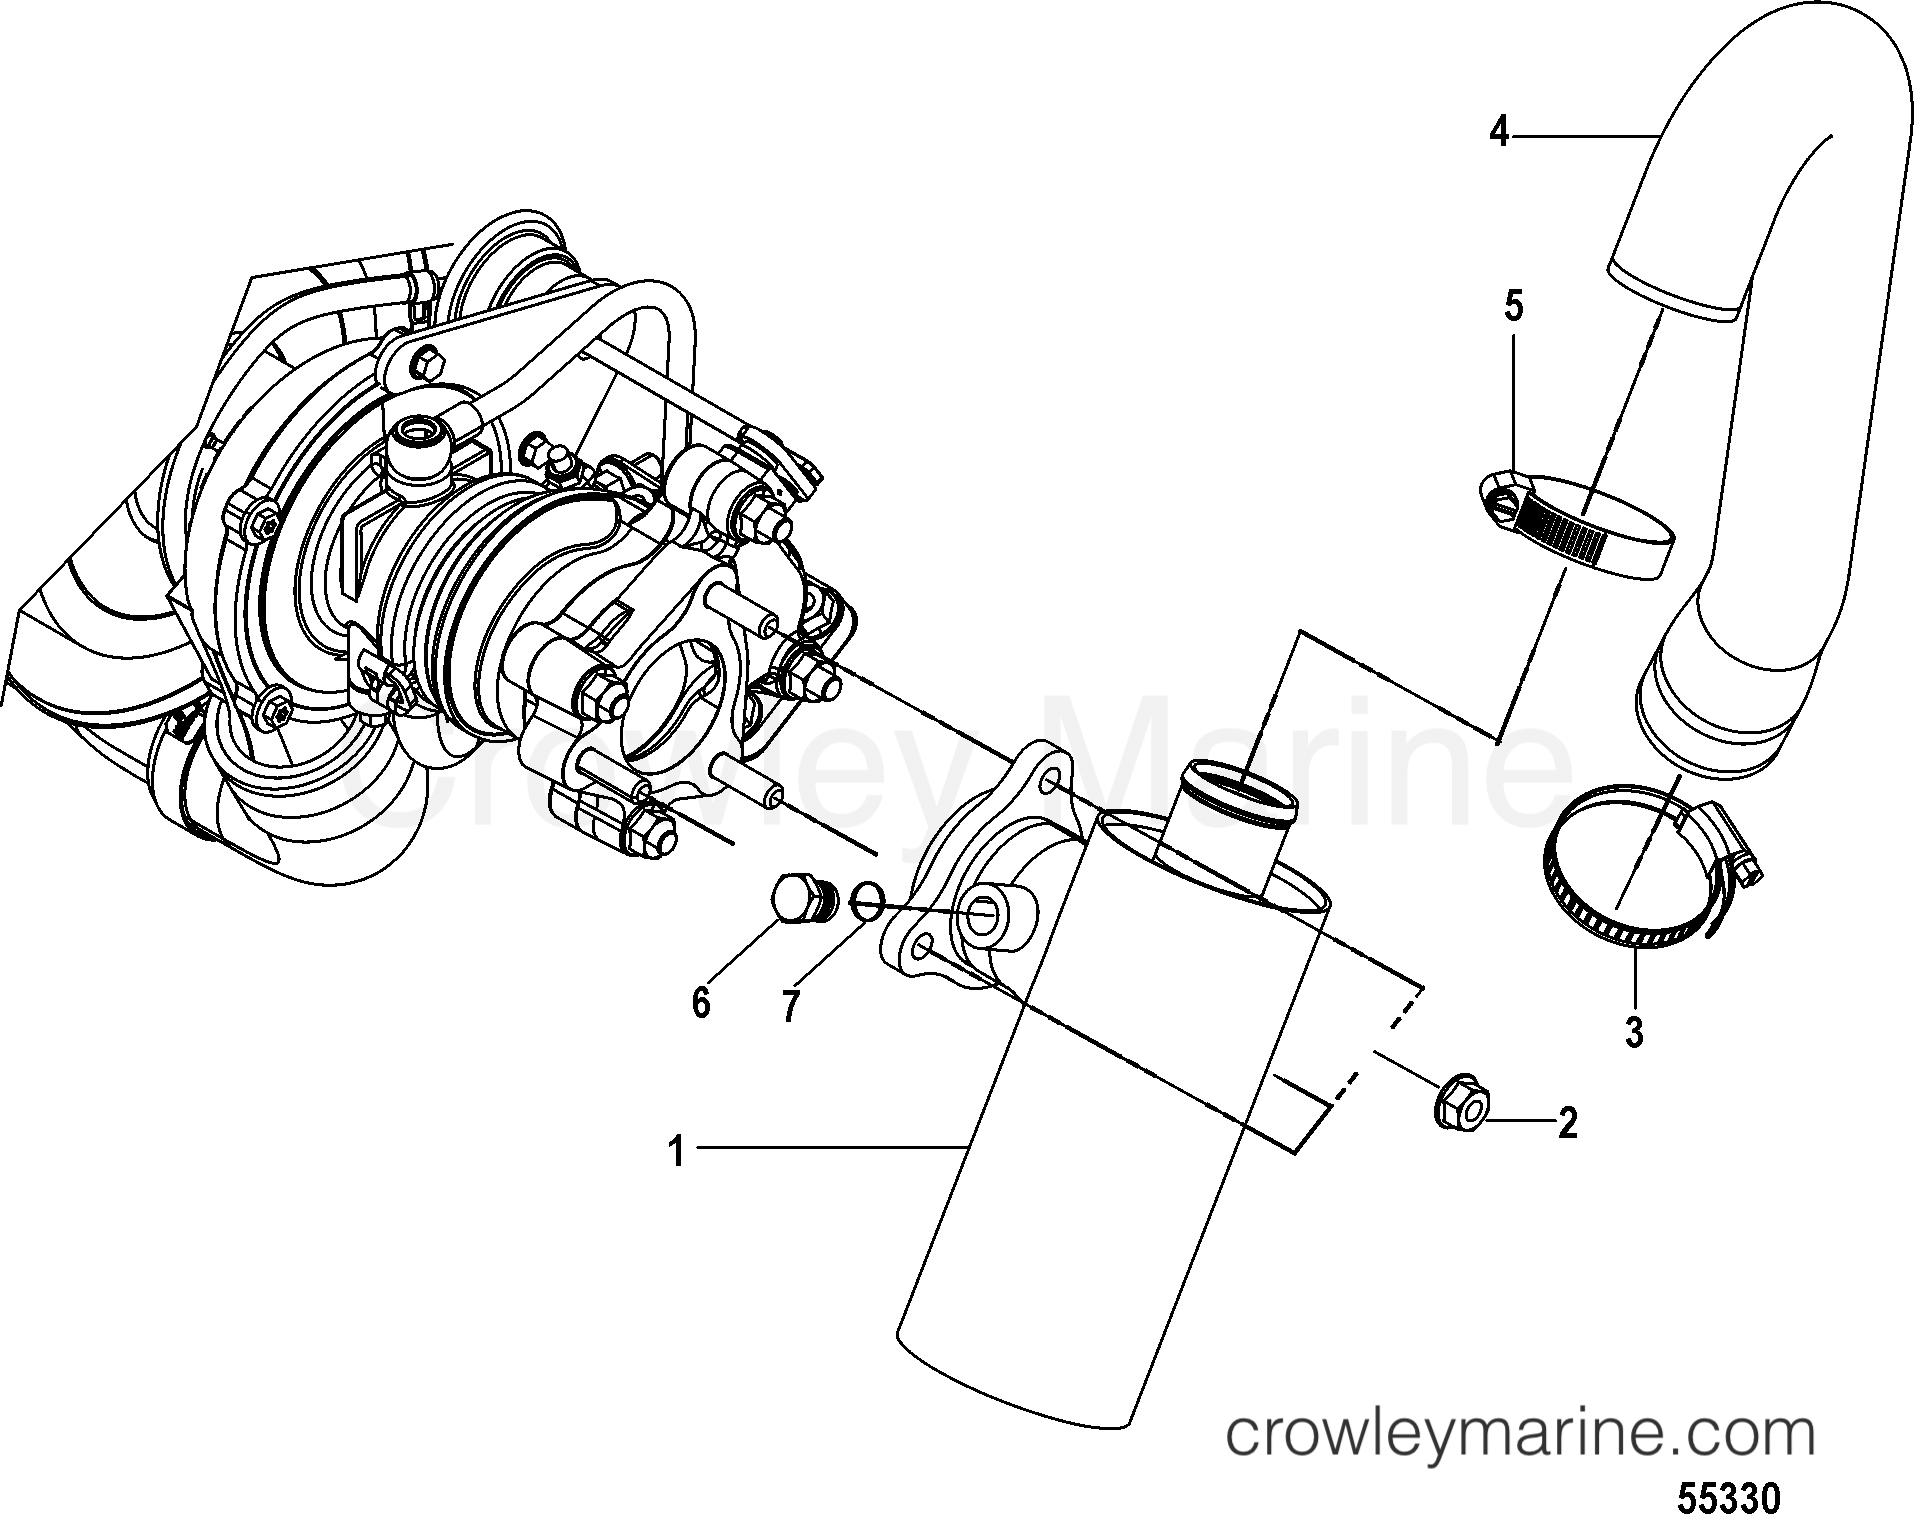 exhaust components inboard 2014 mercury inboard engine 2 0l ei 170 30200071u crowley marine